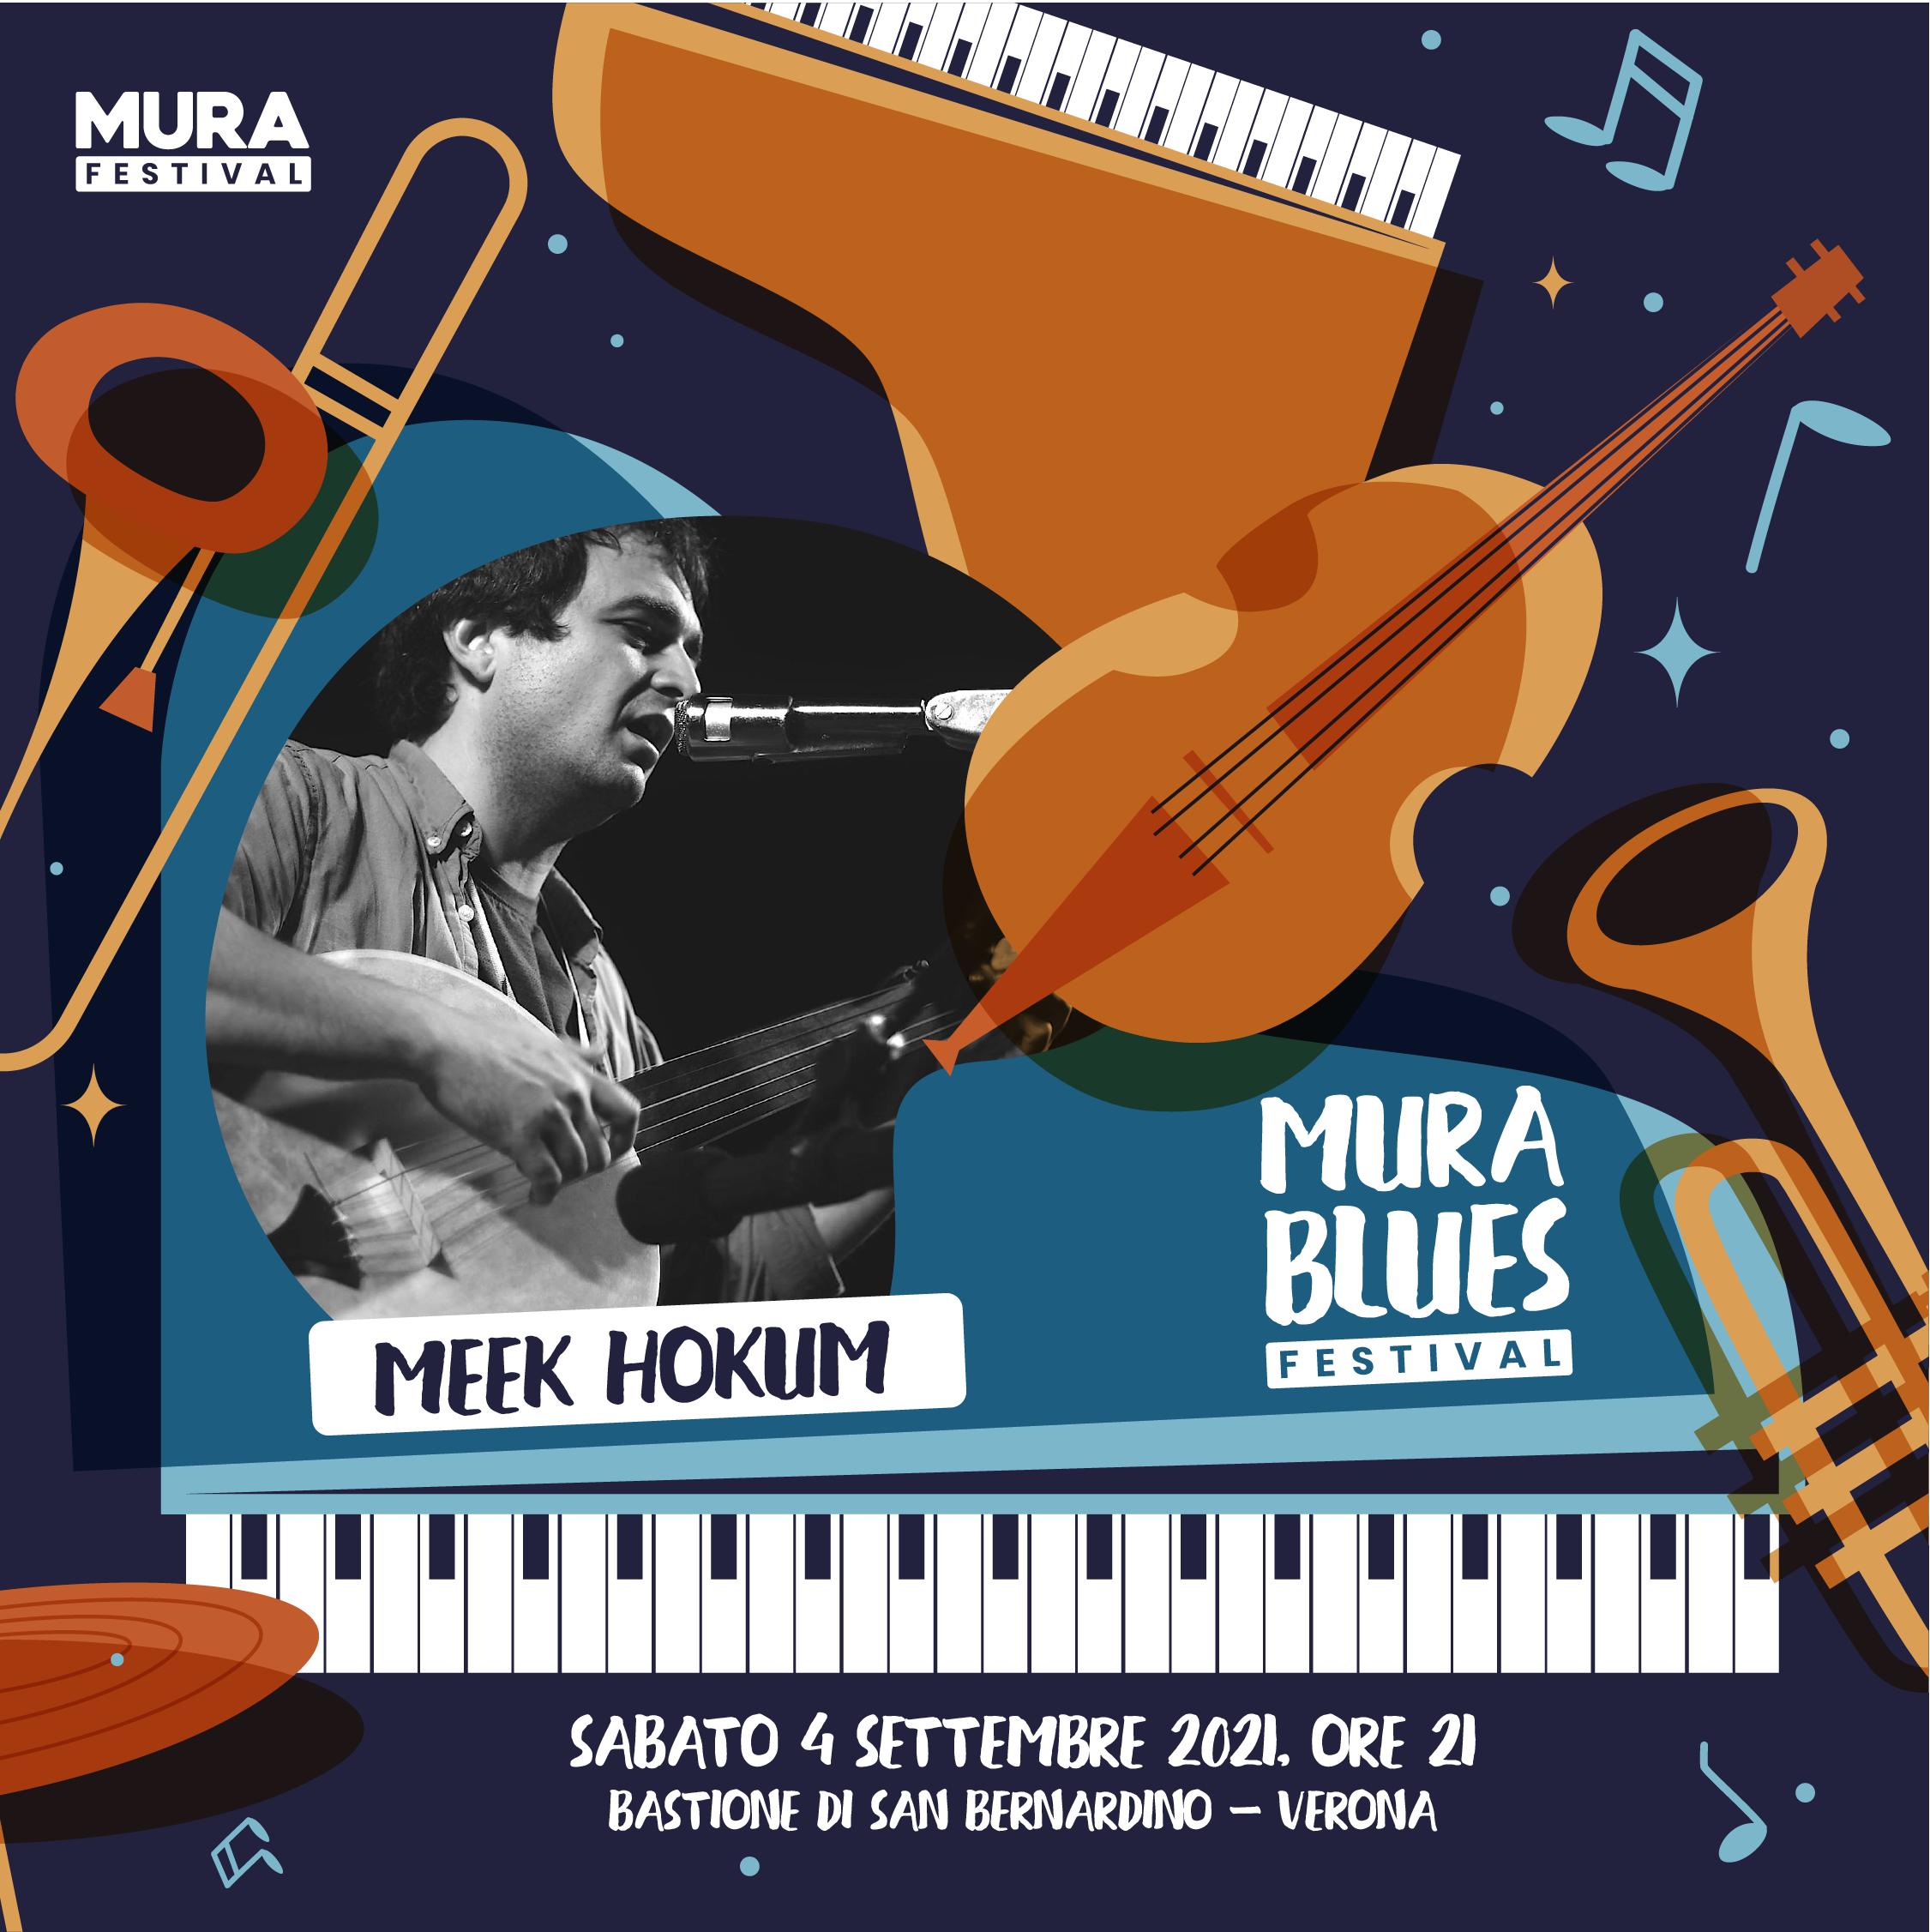 Mura Blues Festival Meek Hokum